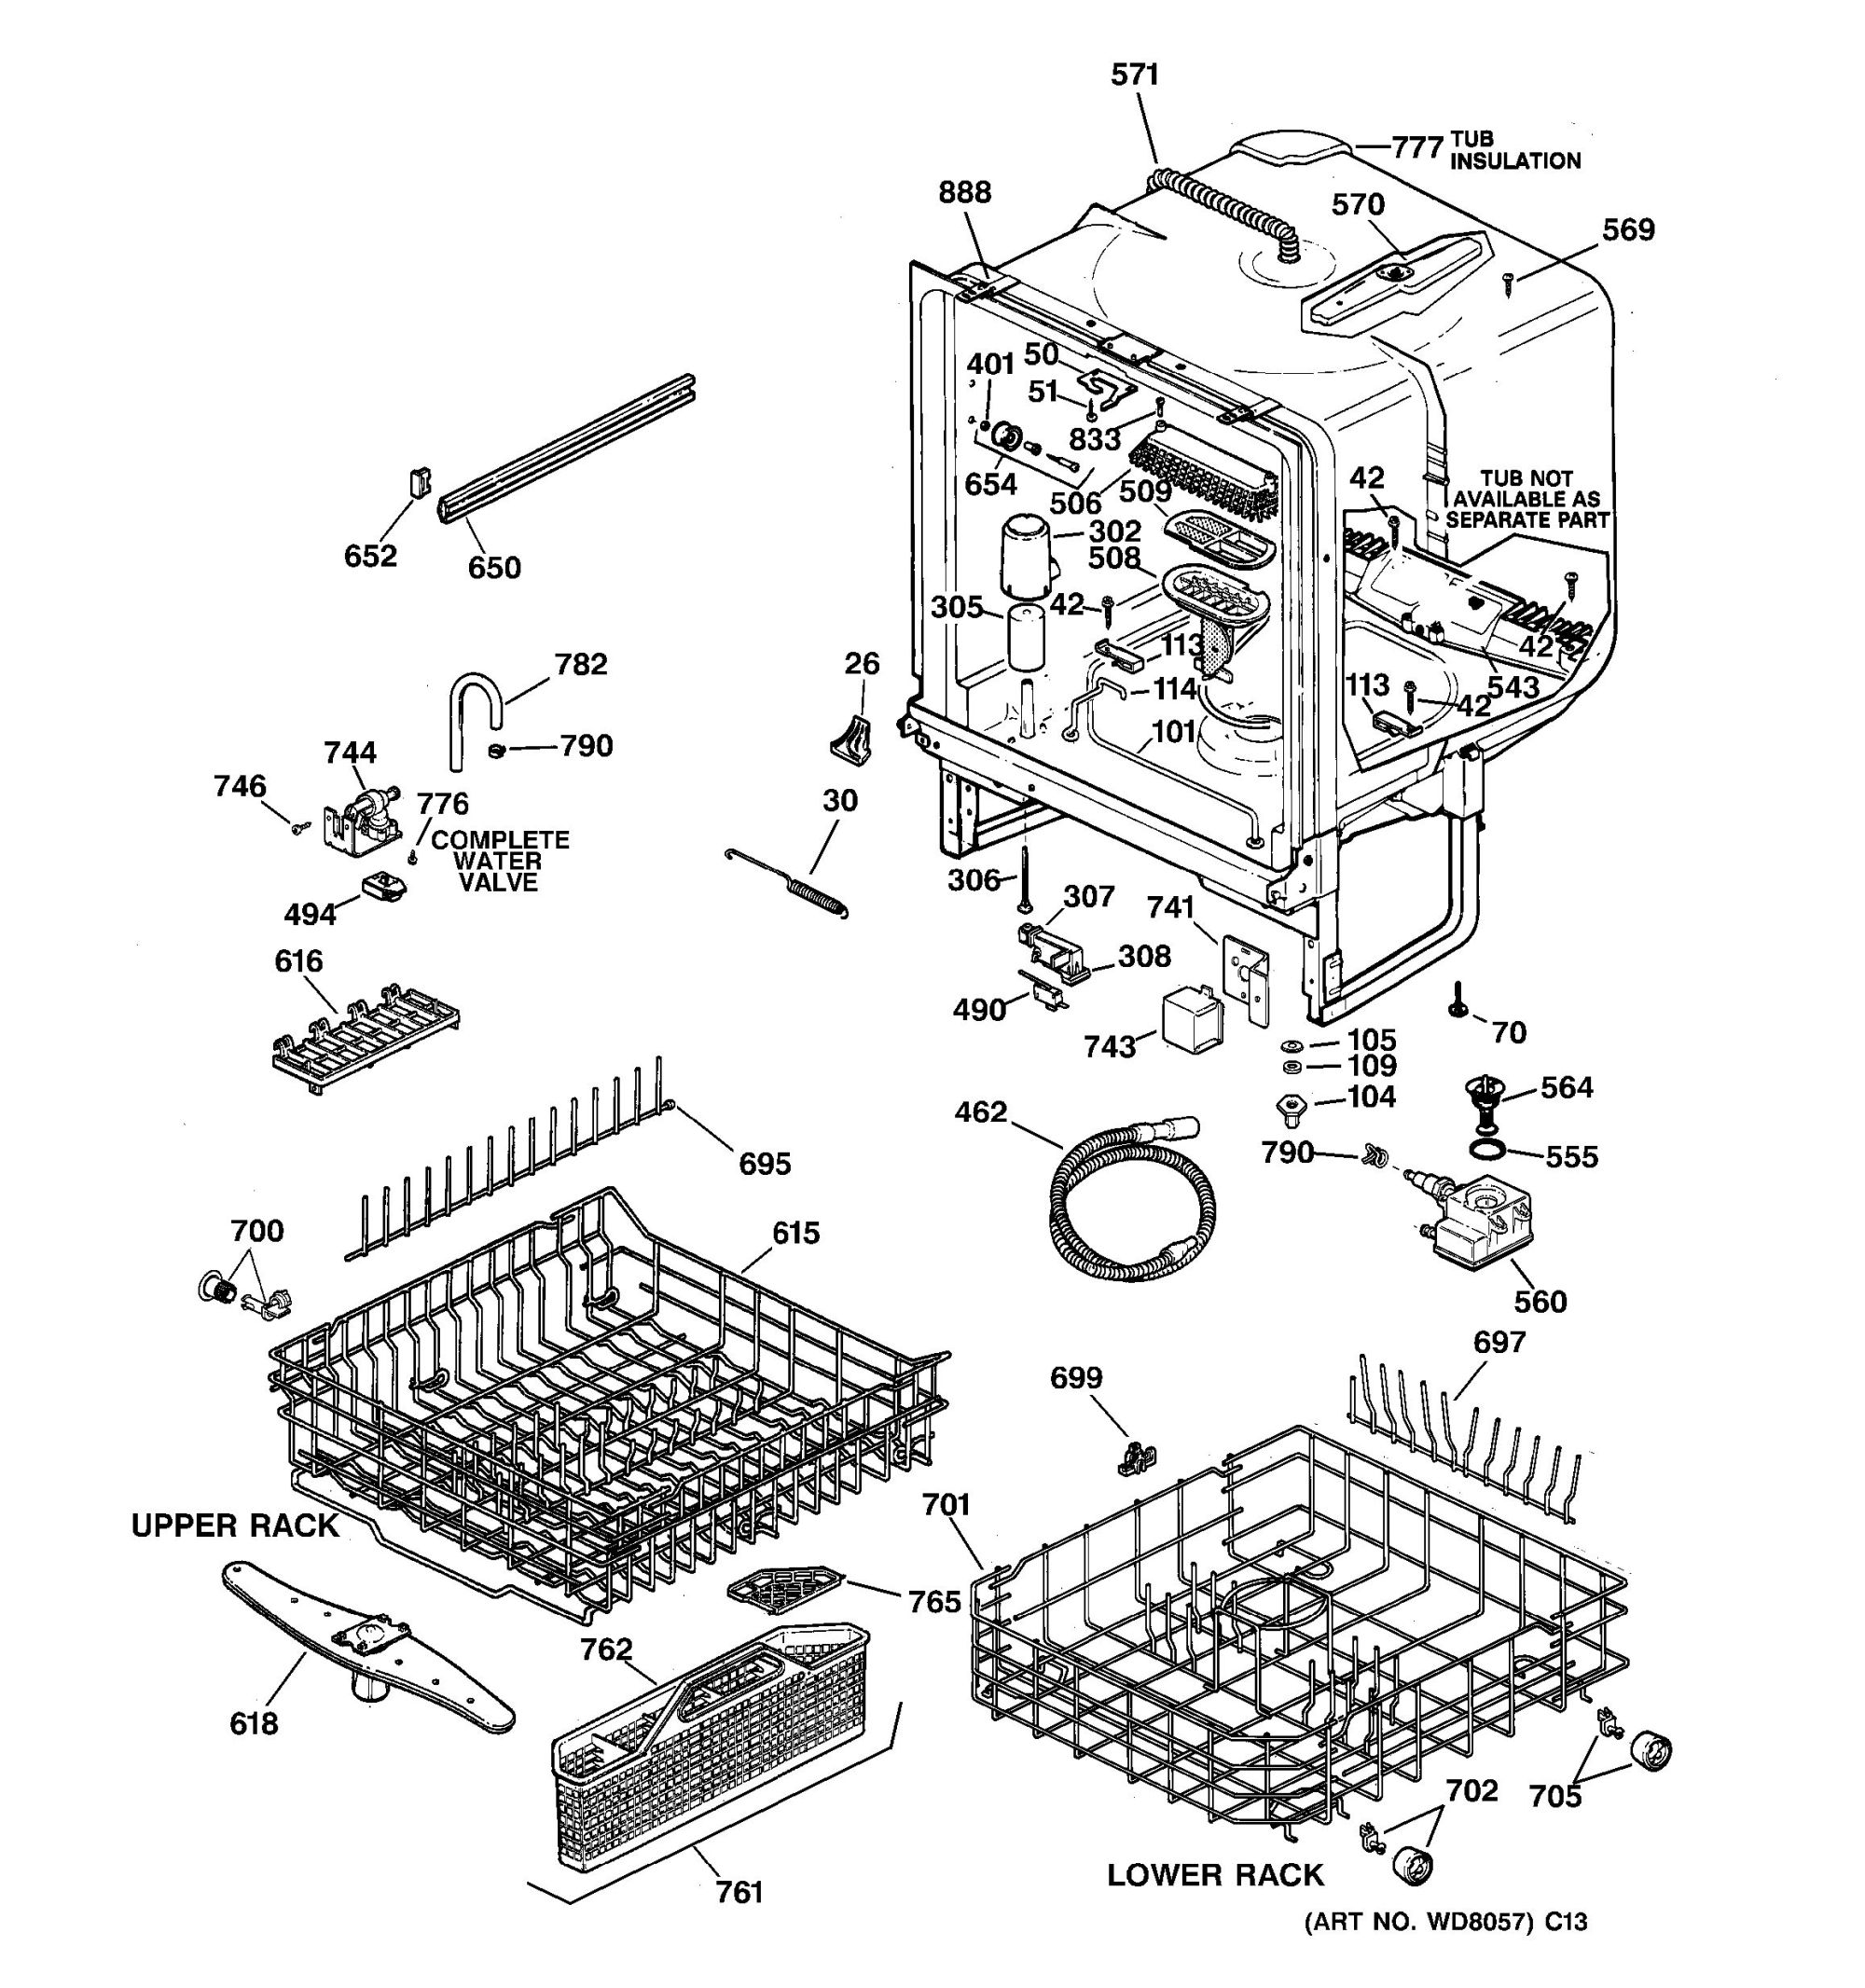 hight resolution of ge dishwasher diagram wiring diagram operationsge dishwasher diagram